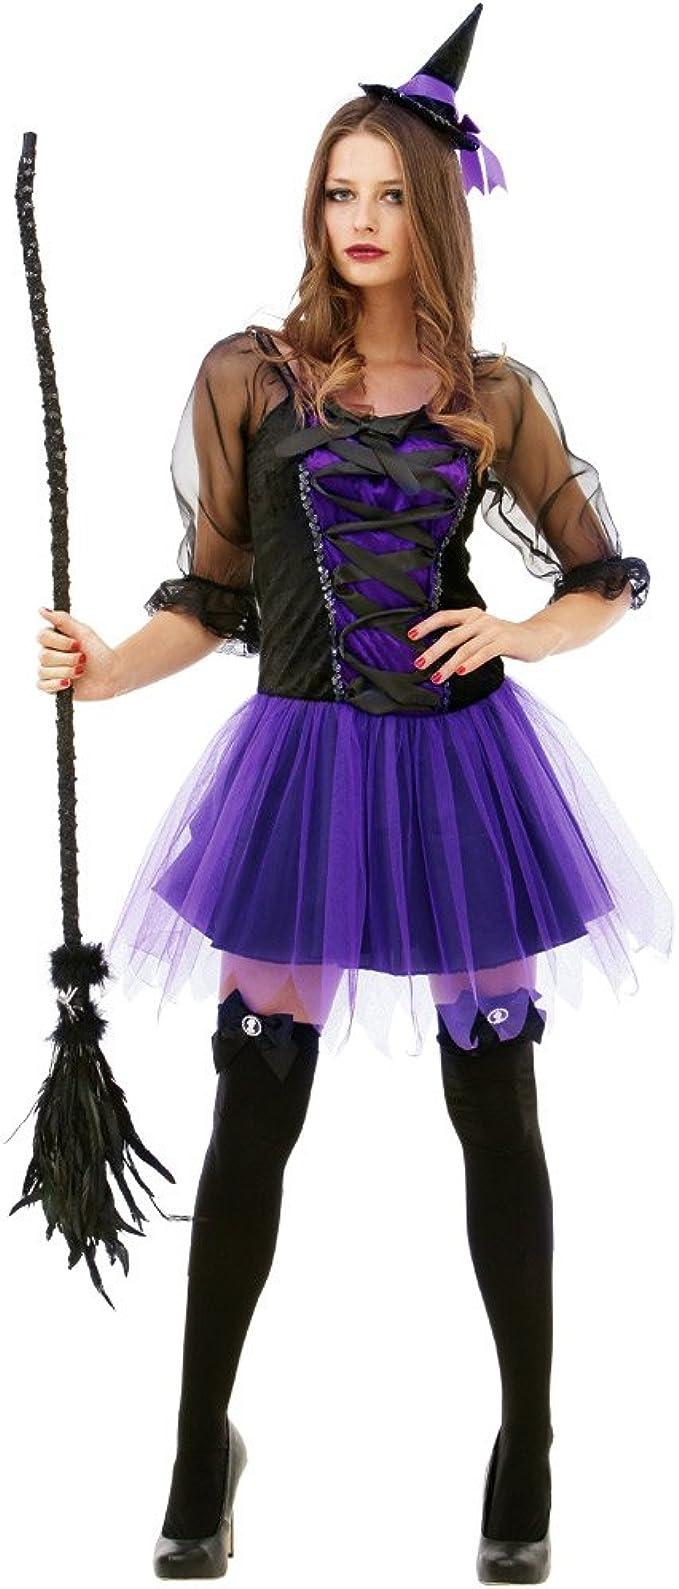 Amazon.com: Spellbinding Sorceress – Disfraz para Halloween ...